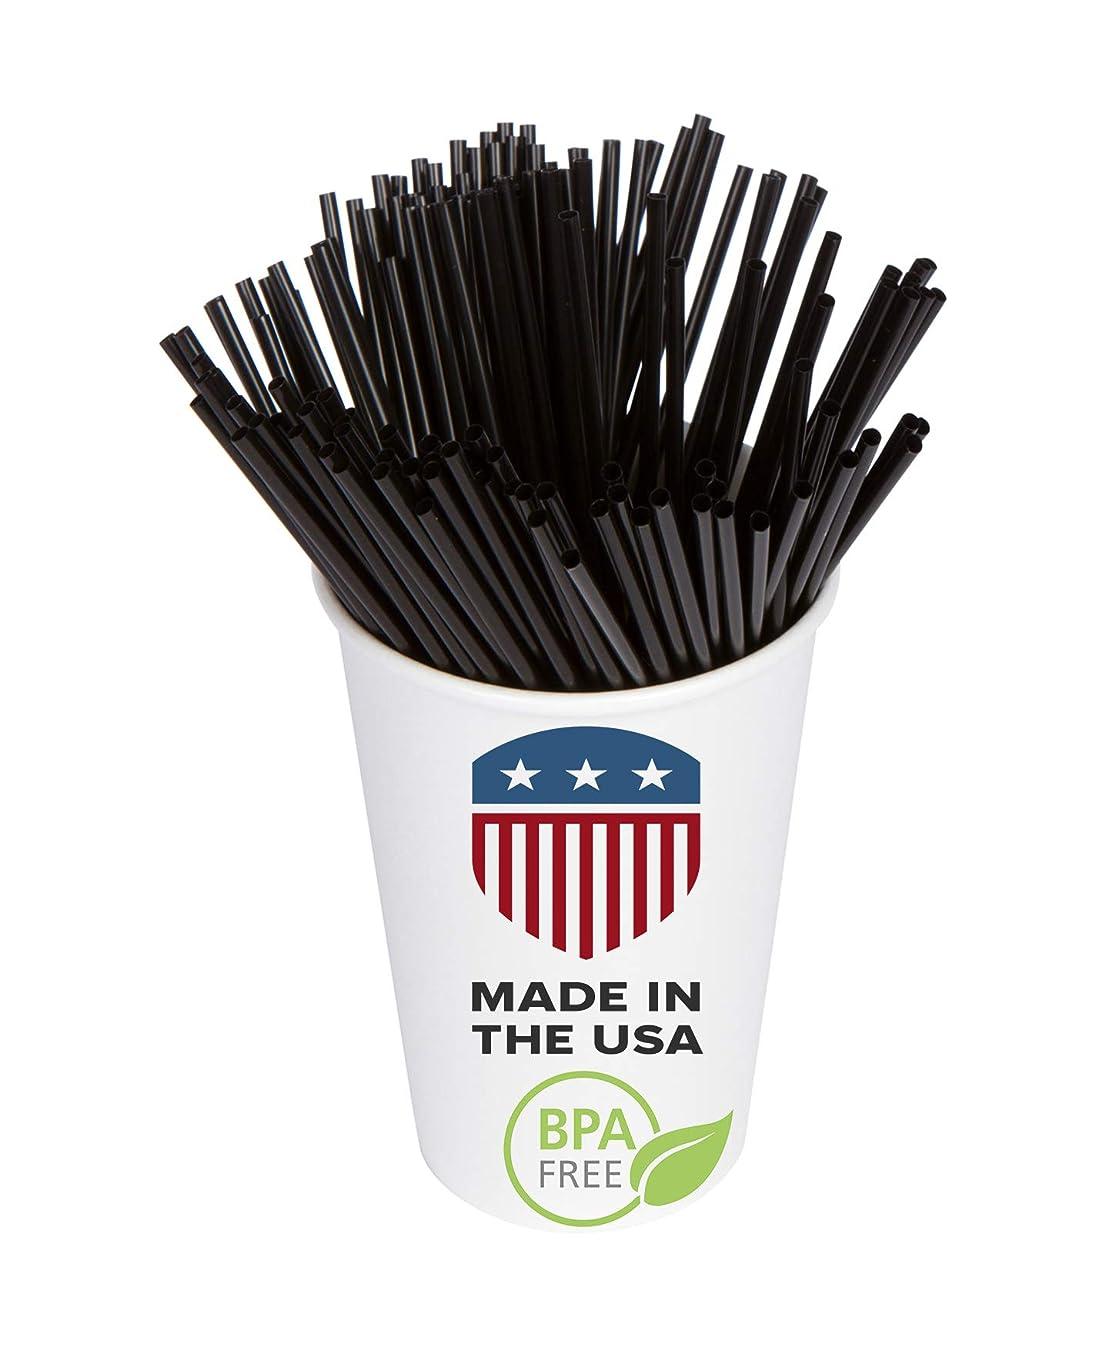 Coffee Stir Sticks, Plastic Stirrers: USA Made, BPA Free: Cocktail Straws, 5.25